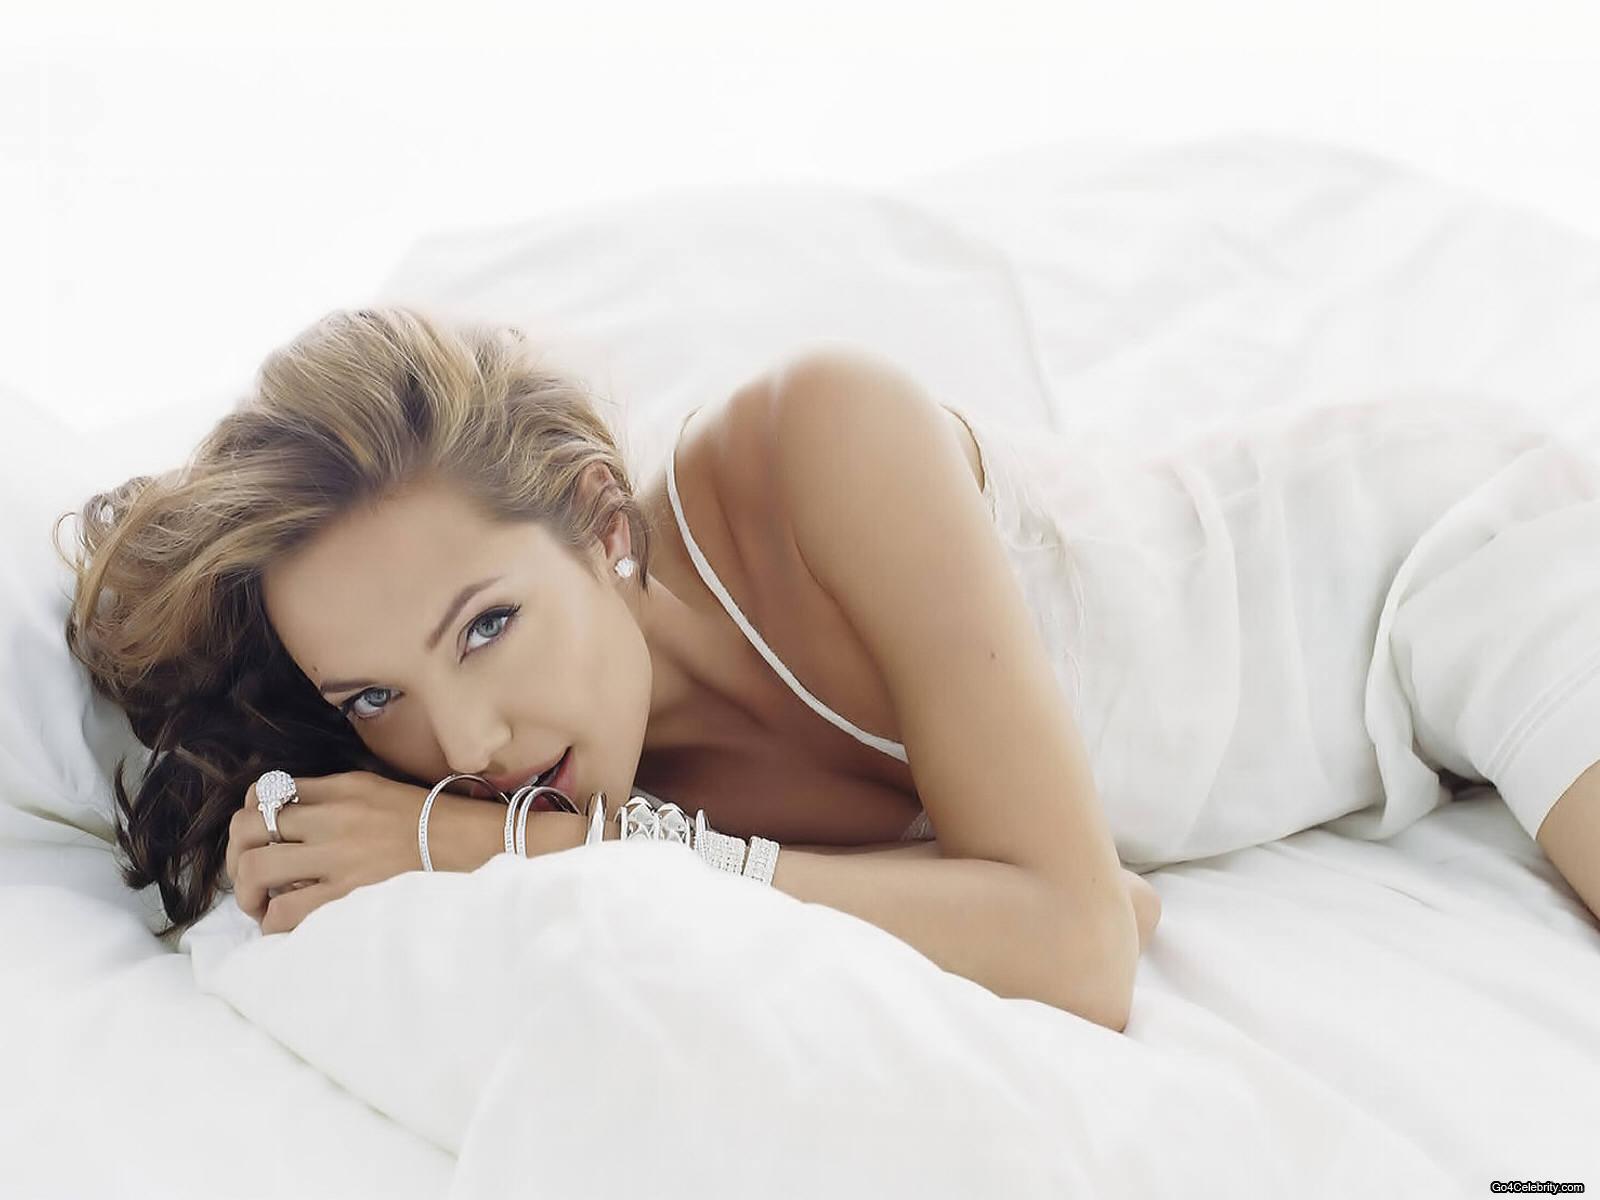 http://2.bp.blogspot.com/_dRwDJbOL9k4/SwrHIkxLwII/AAAAAAAABz0/ETYI_n4-iRA/s1600/Angelina-Jolie-107.jpg